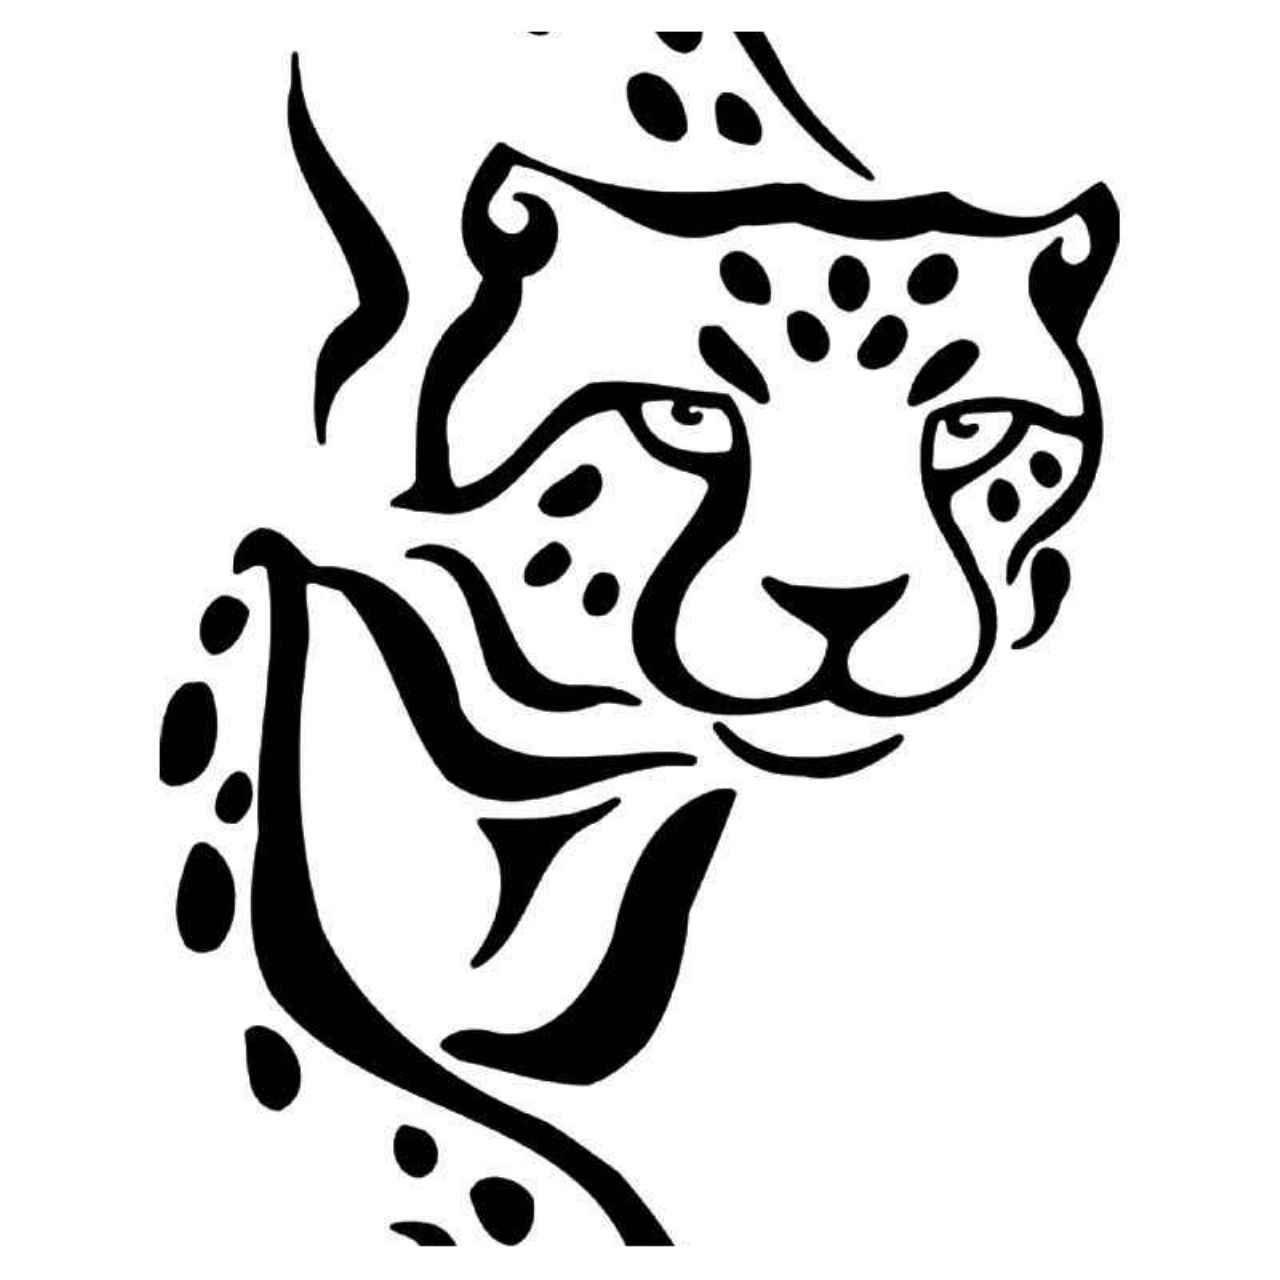 1280x1280 tribal cheetah vinyl decal sticker cats vinyl decals, tribal